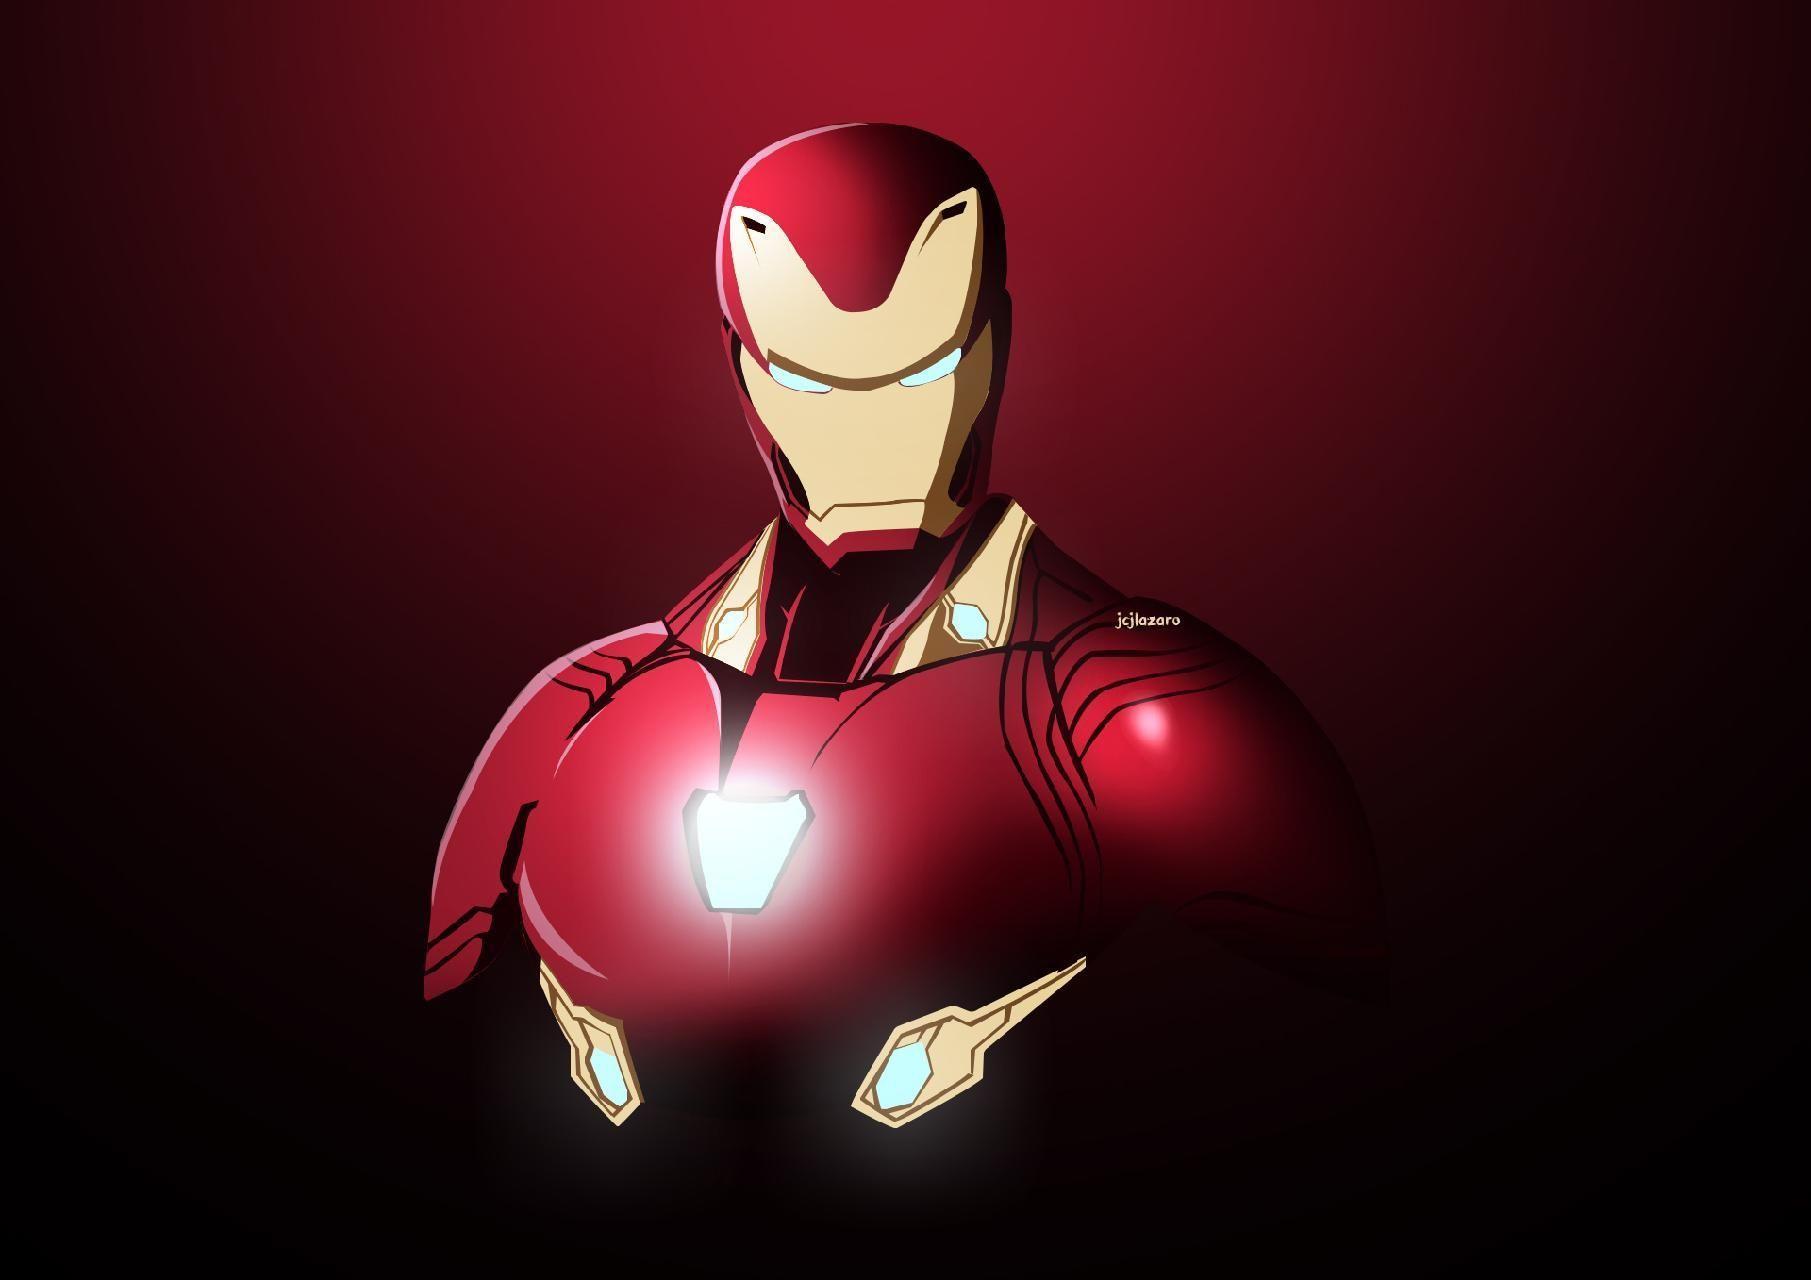 Iron Man Mark 50 Wallpapers Top Free Iron Man Mark 50